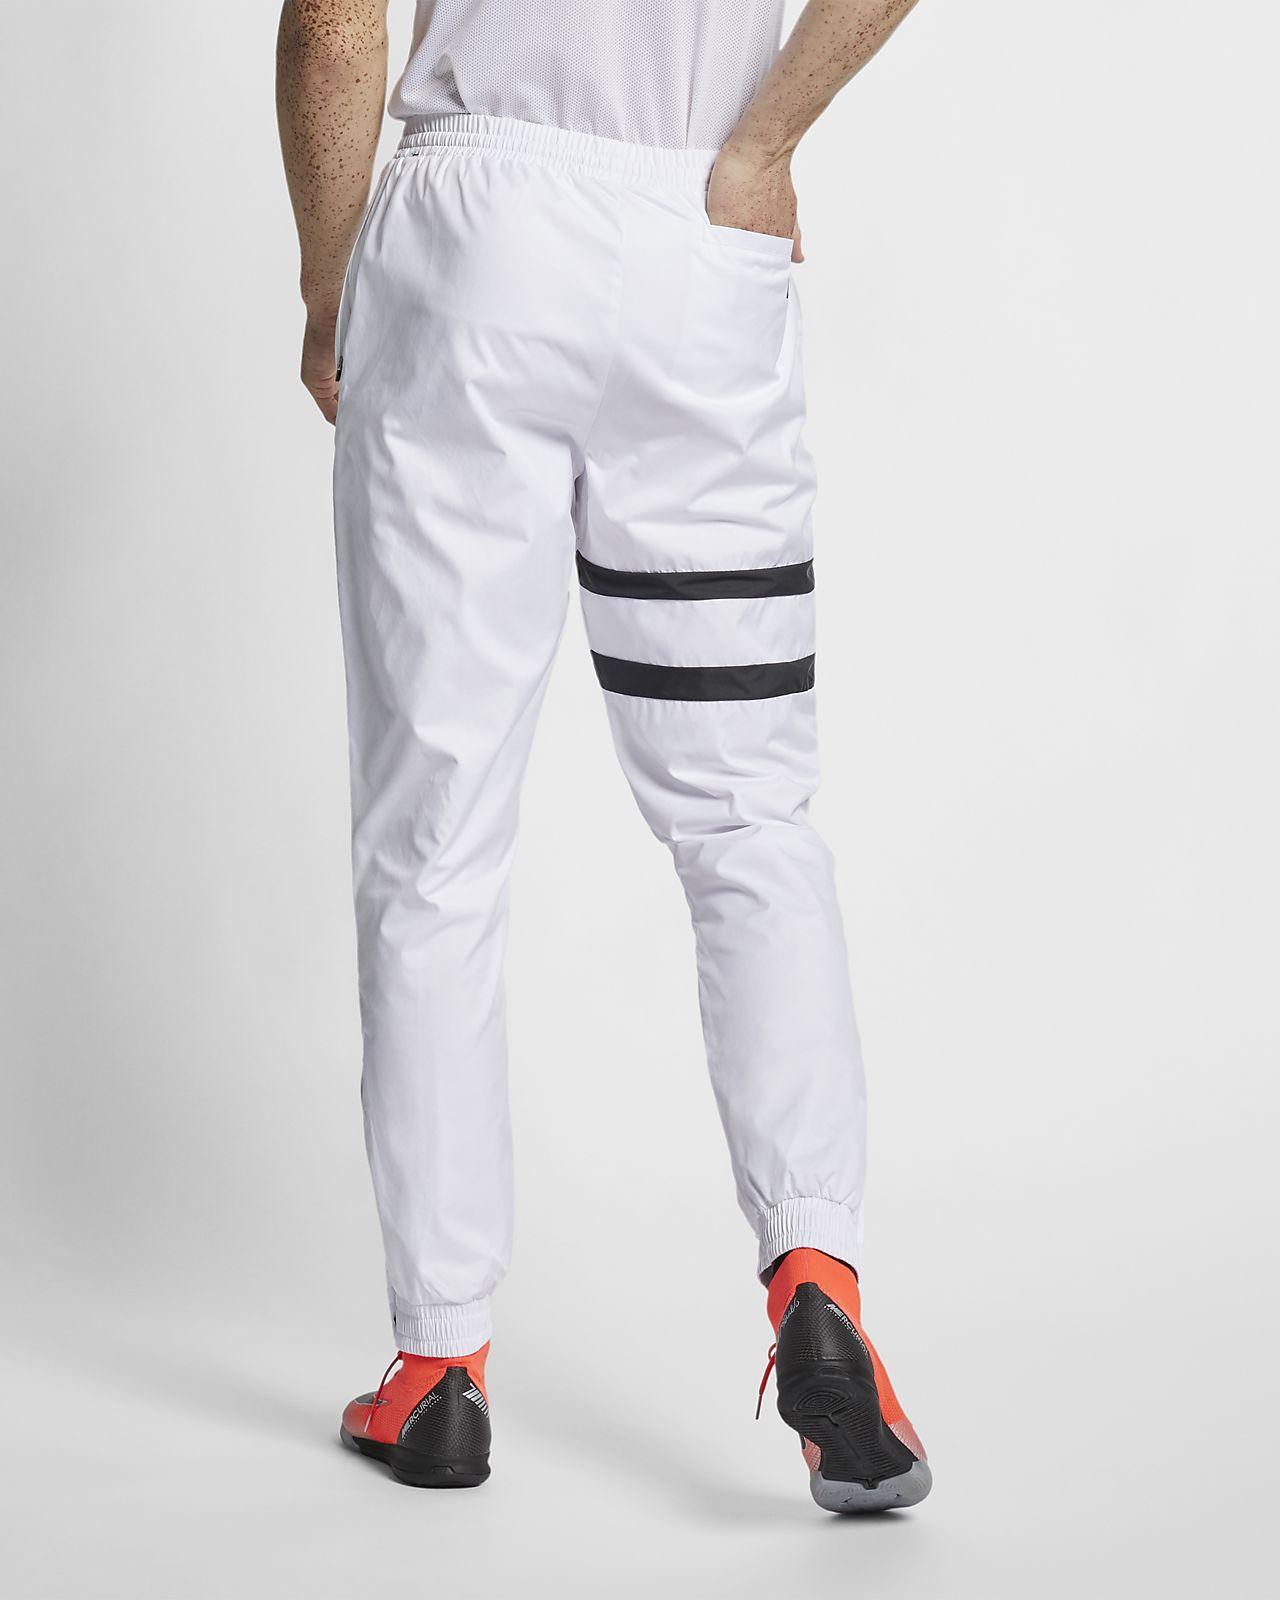 F Nike Homme De Football Pantalon cPour n8P0wOk